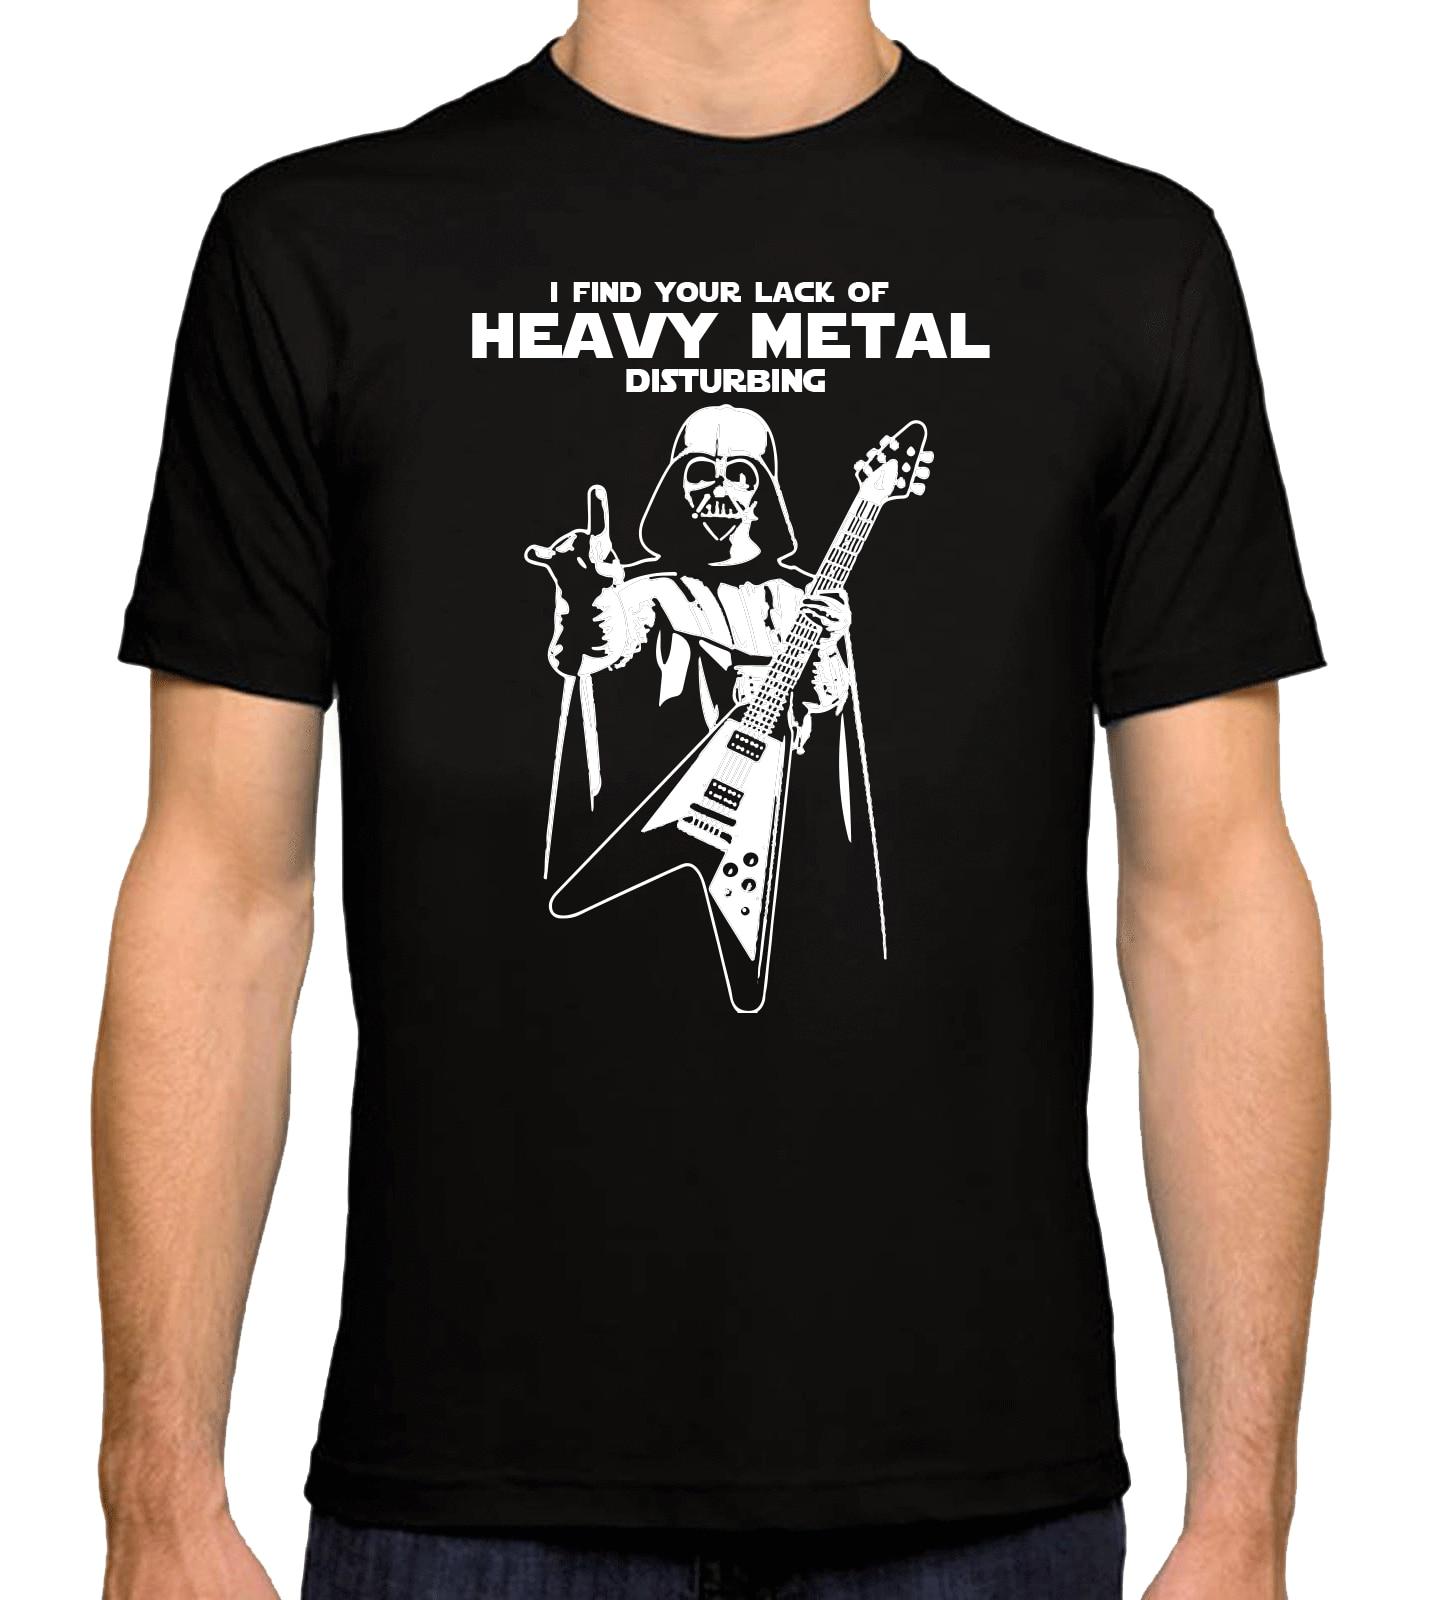 New Inspired by STARWARS Darth Vader HEAVY METAL Rock Tshirt Mens Black T- shirt Sleeve 639cda6717da